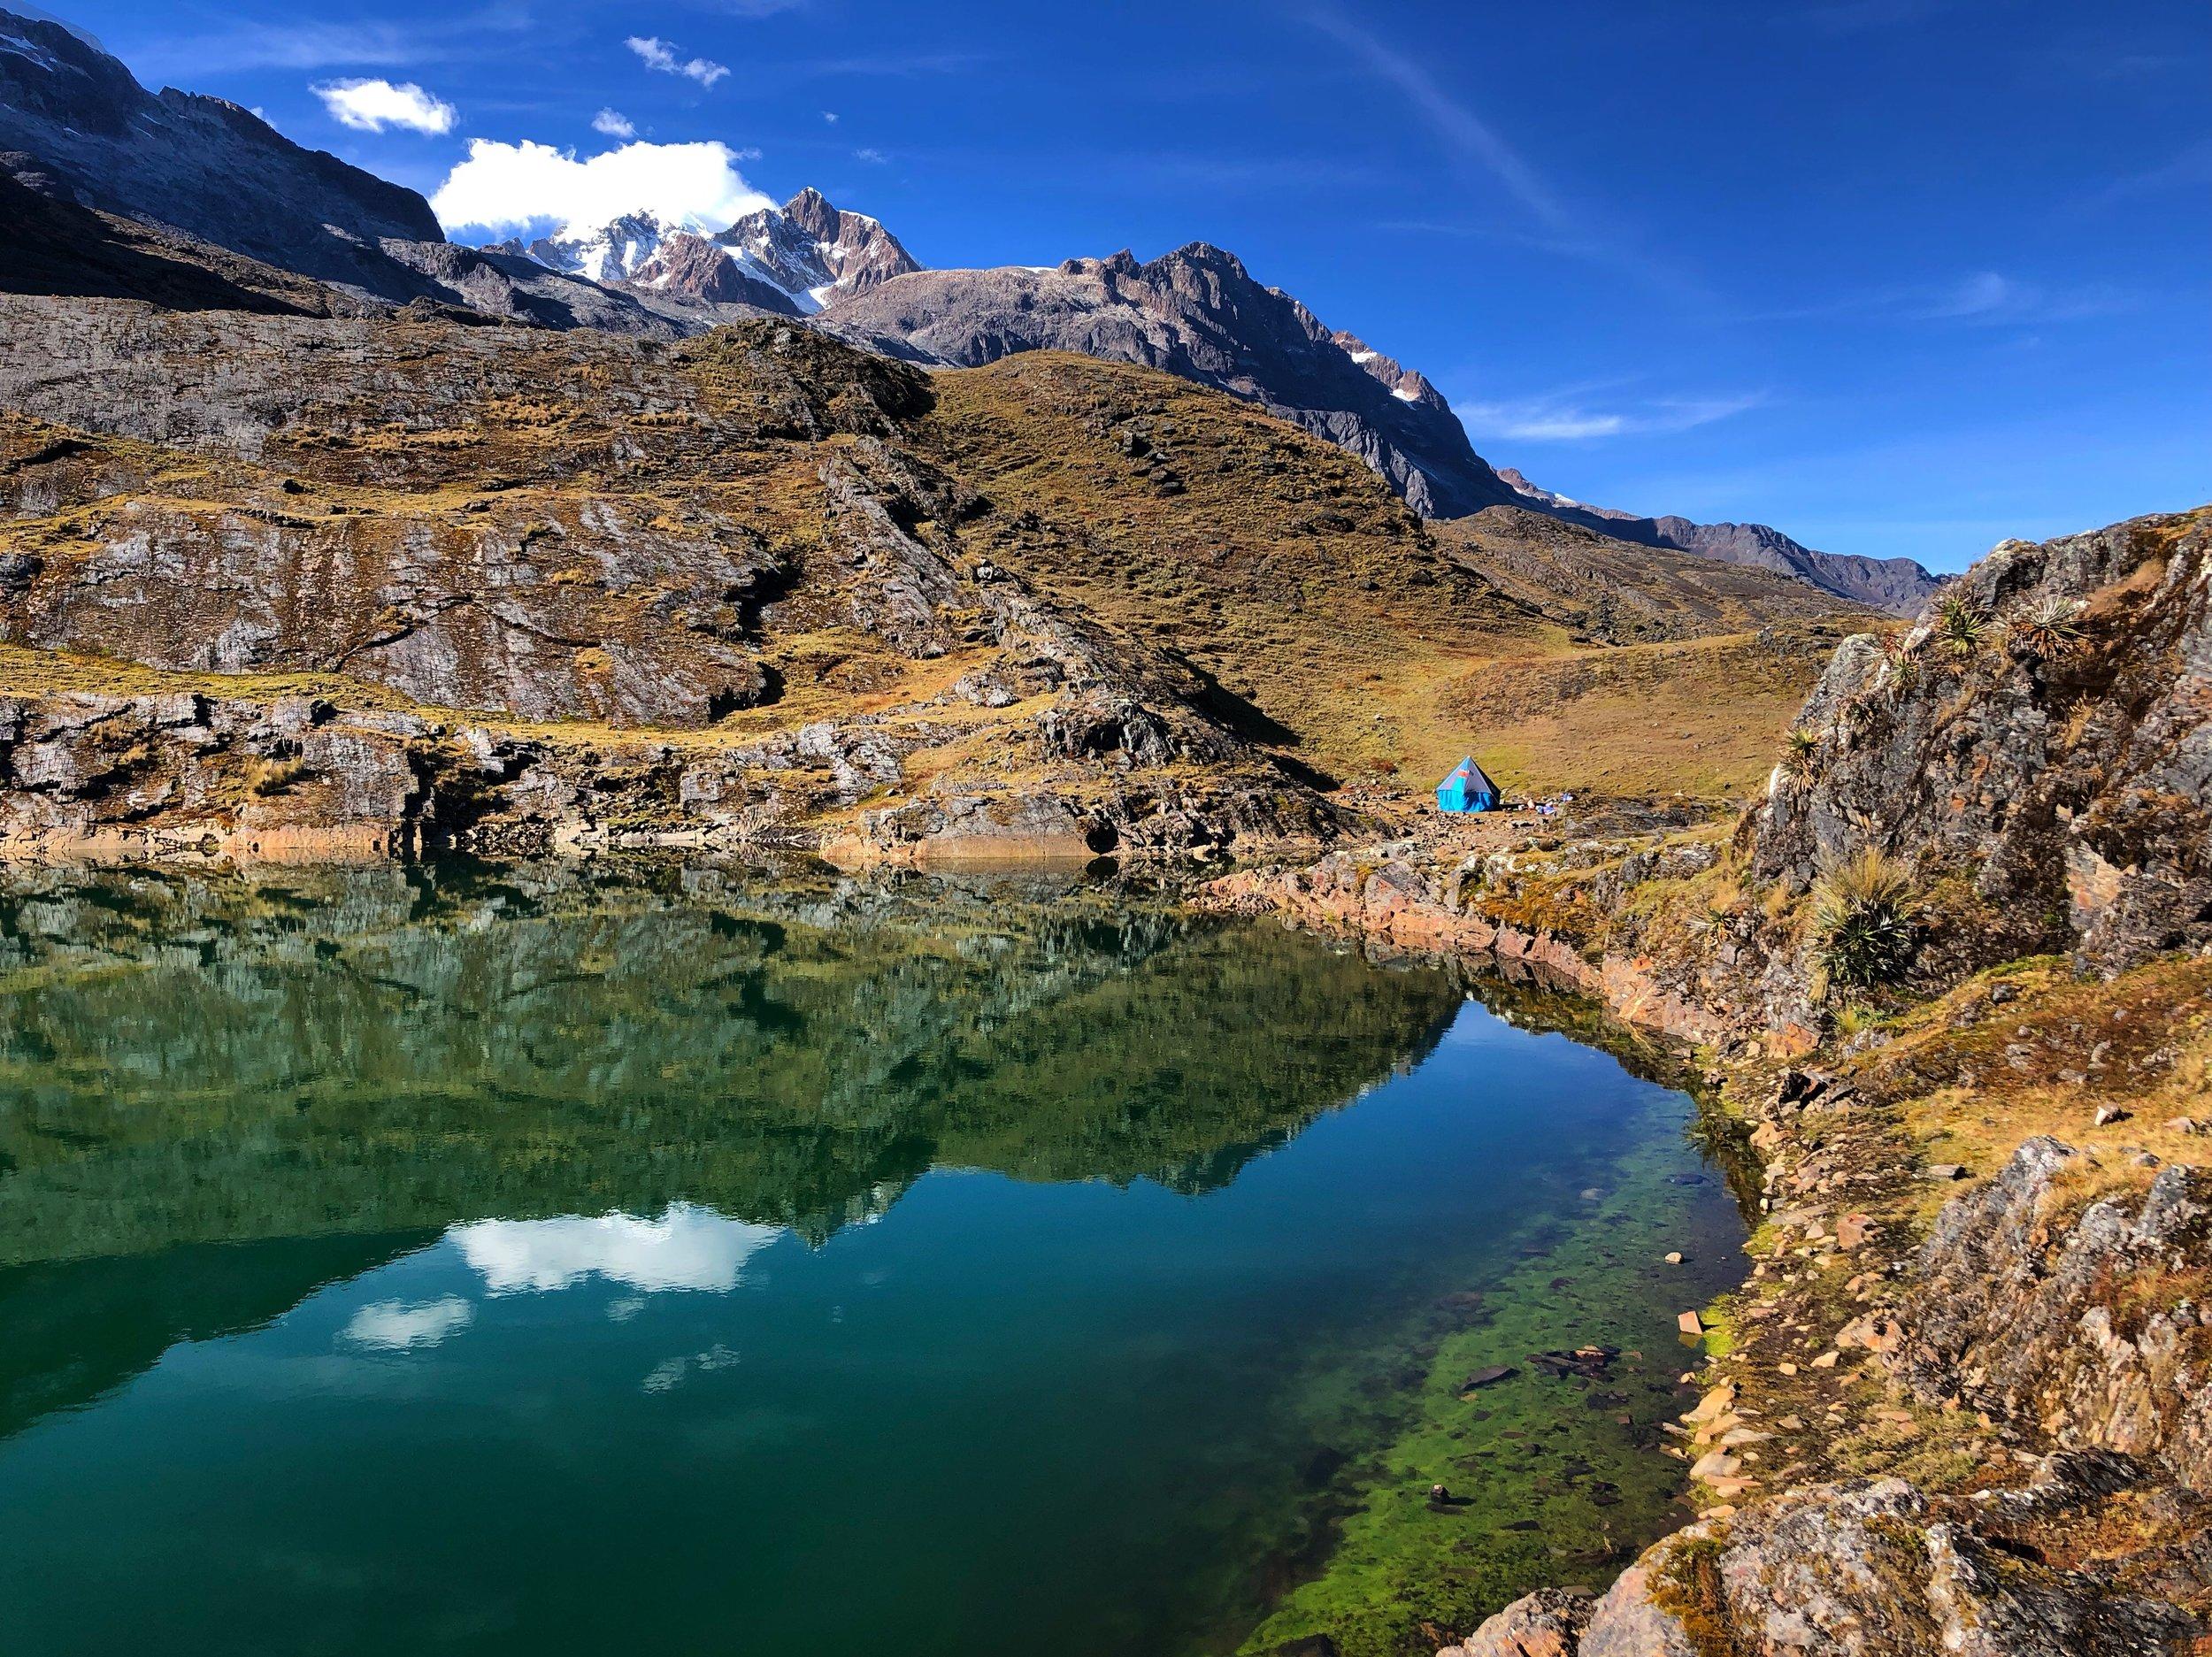 Our camp at Laguna Chillata.